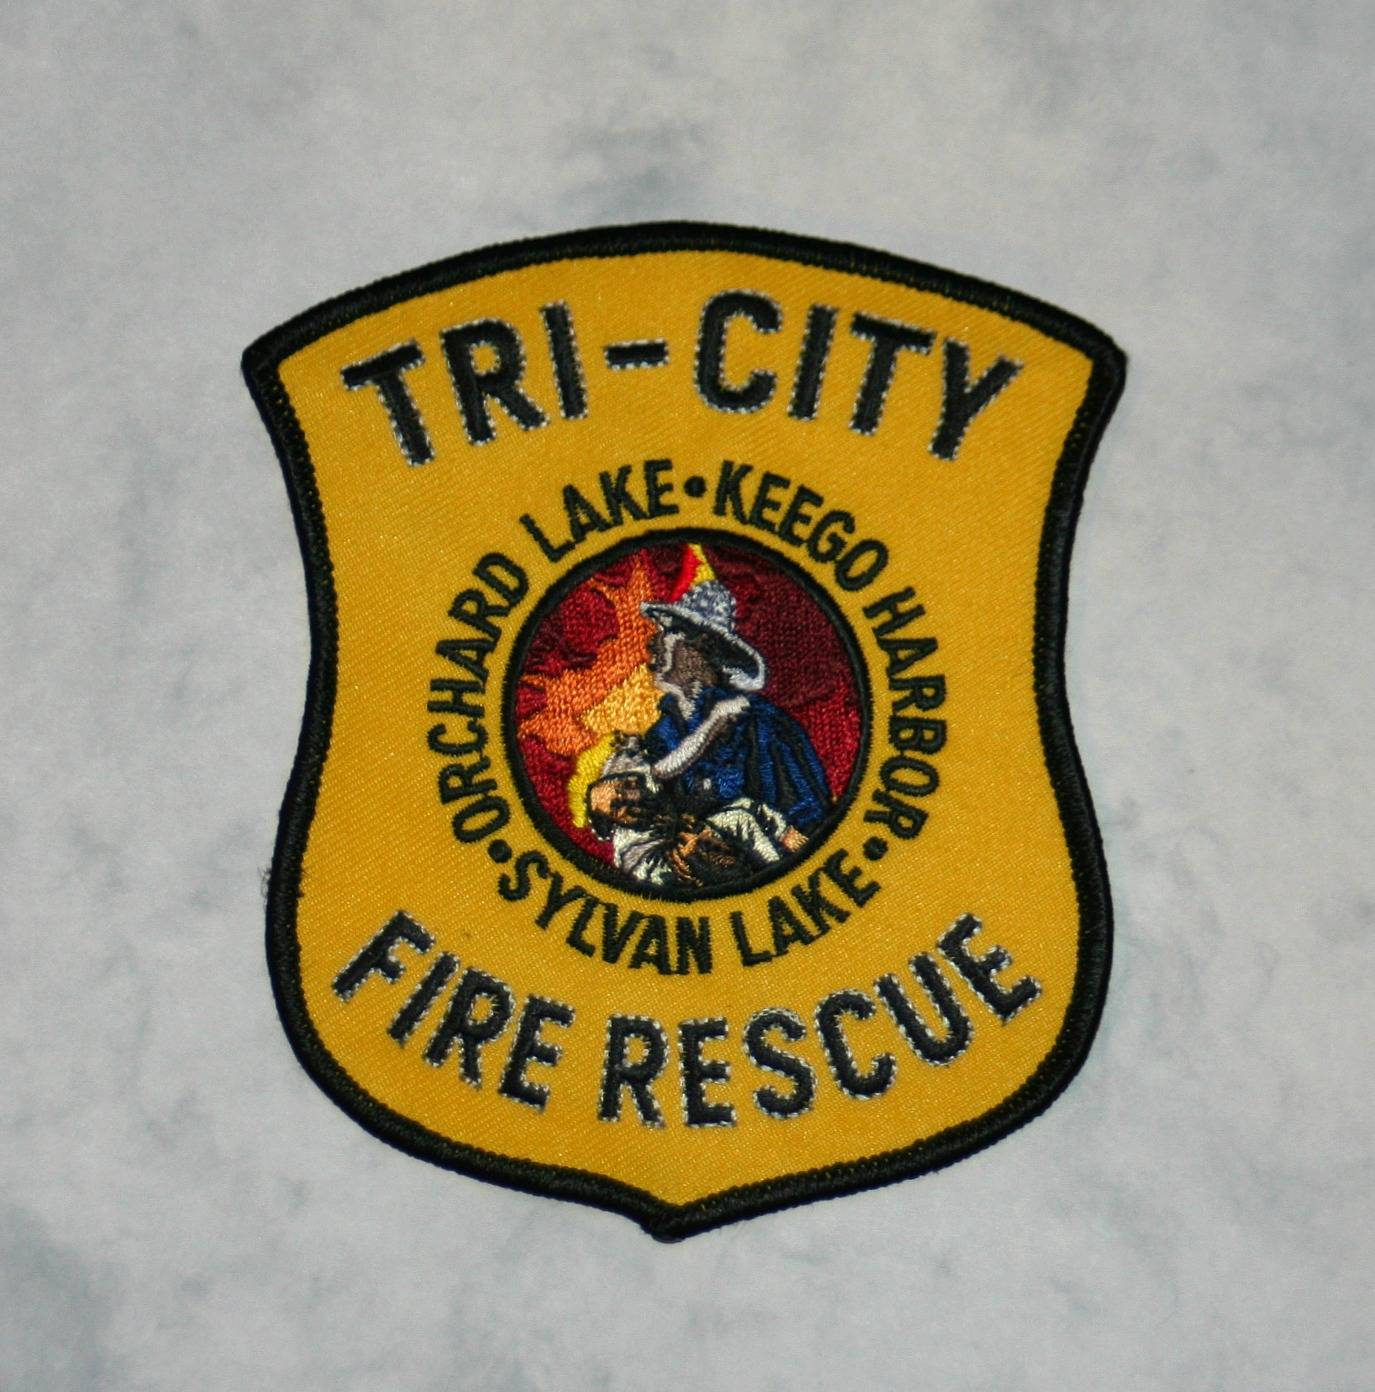 Tri-City, Michigan